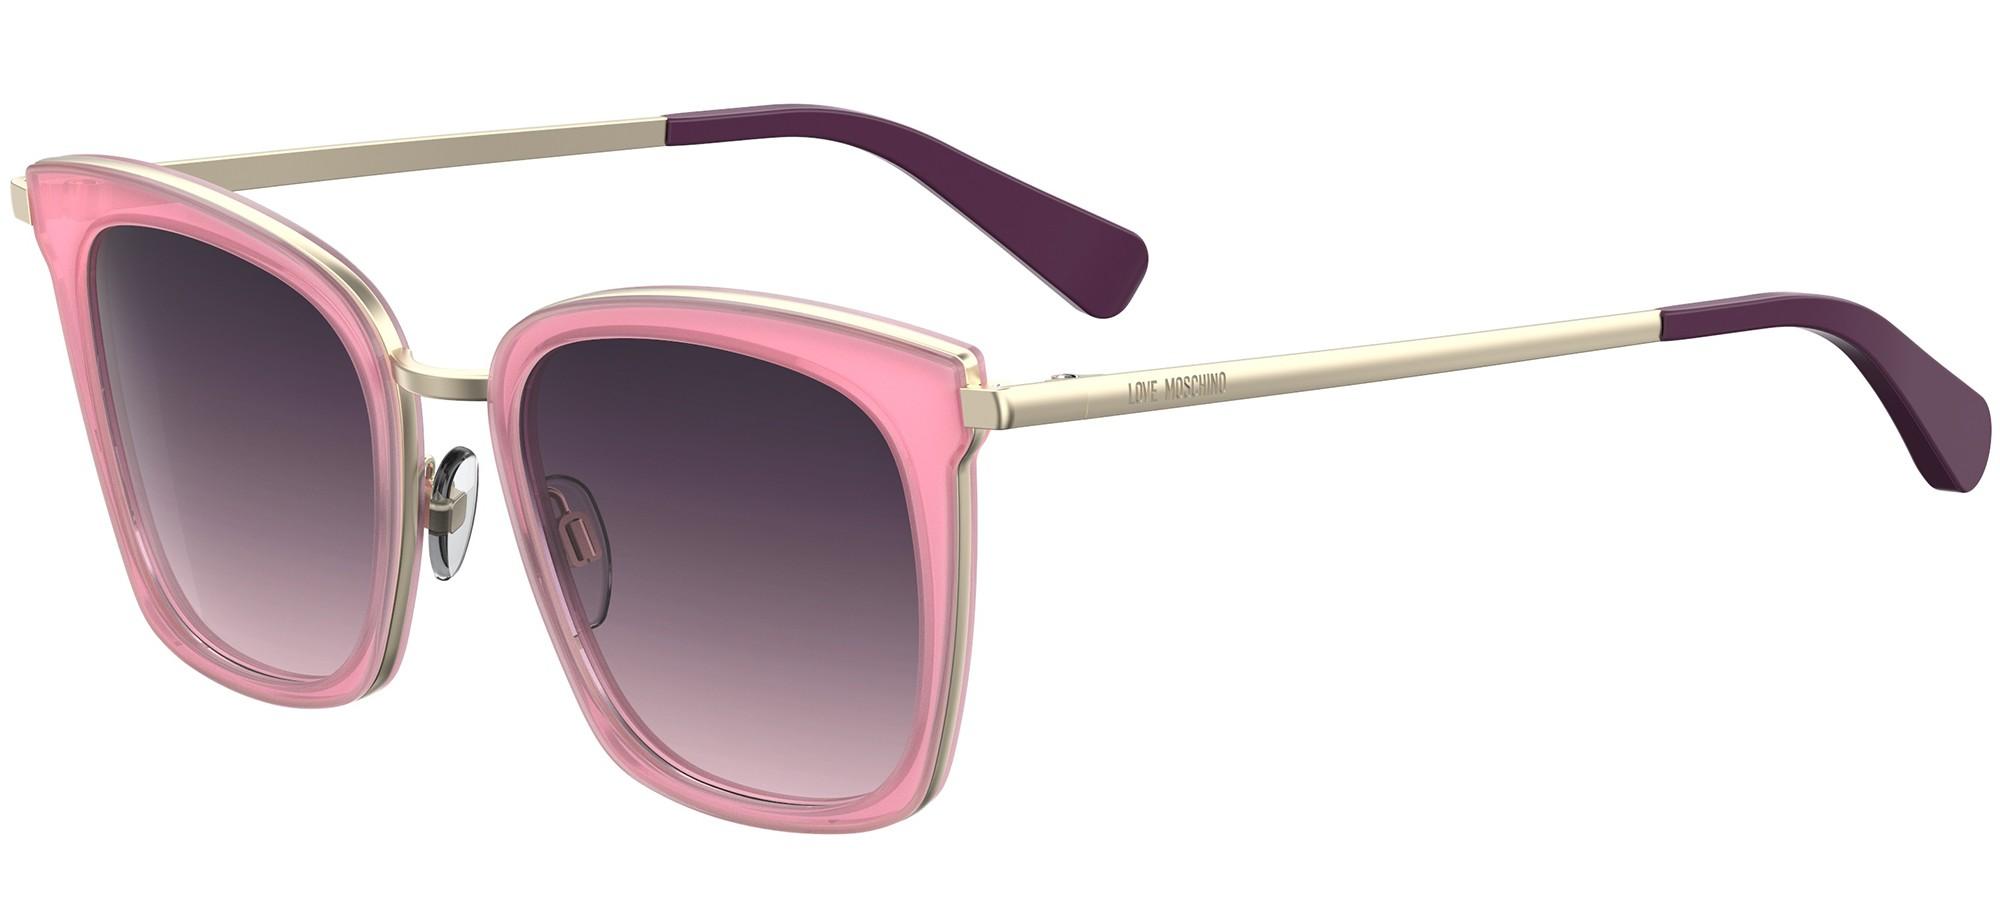 Love Moschino sunglasses MOL007/S